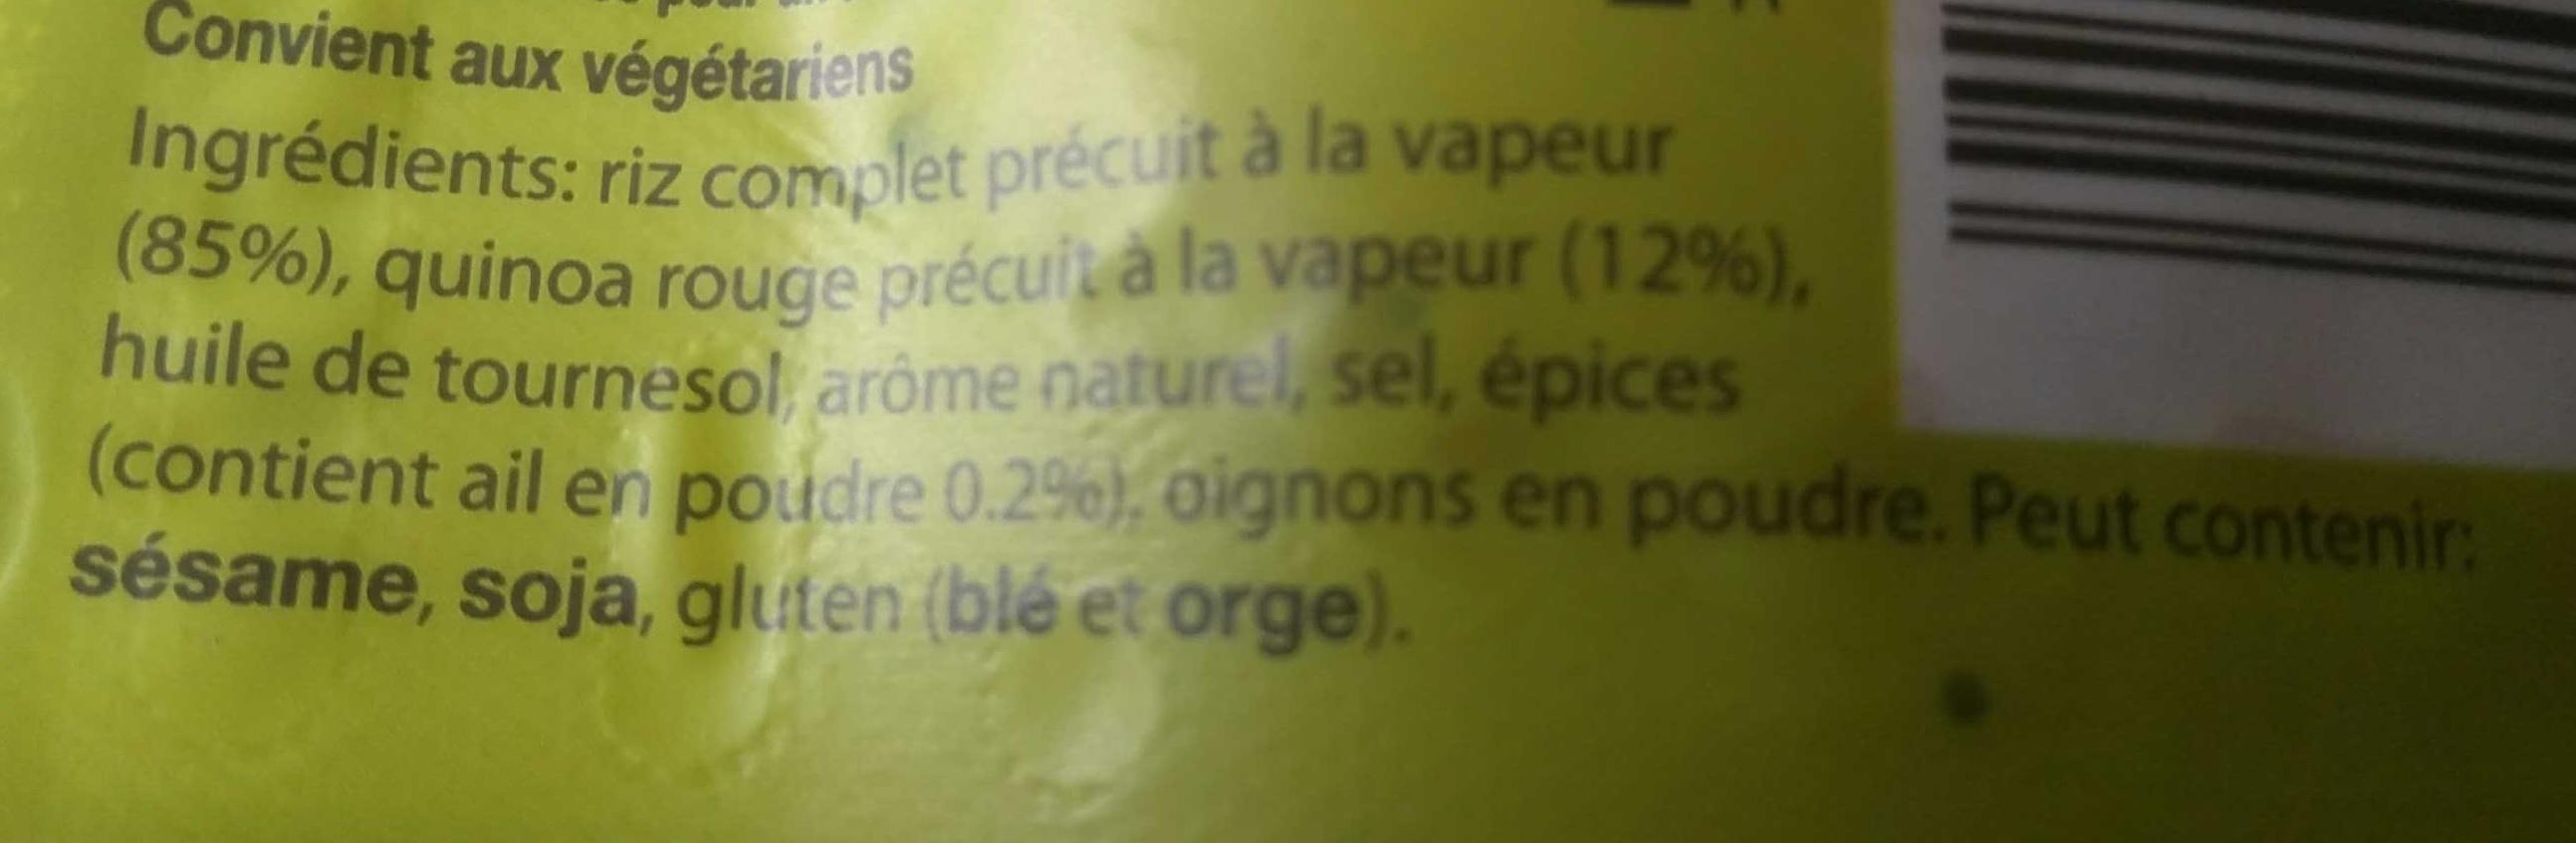 Riz et Quinoa - Ingredients